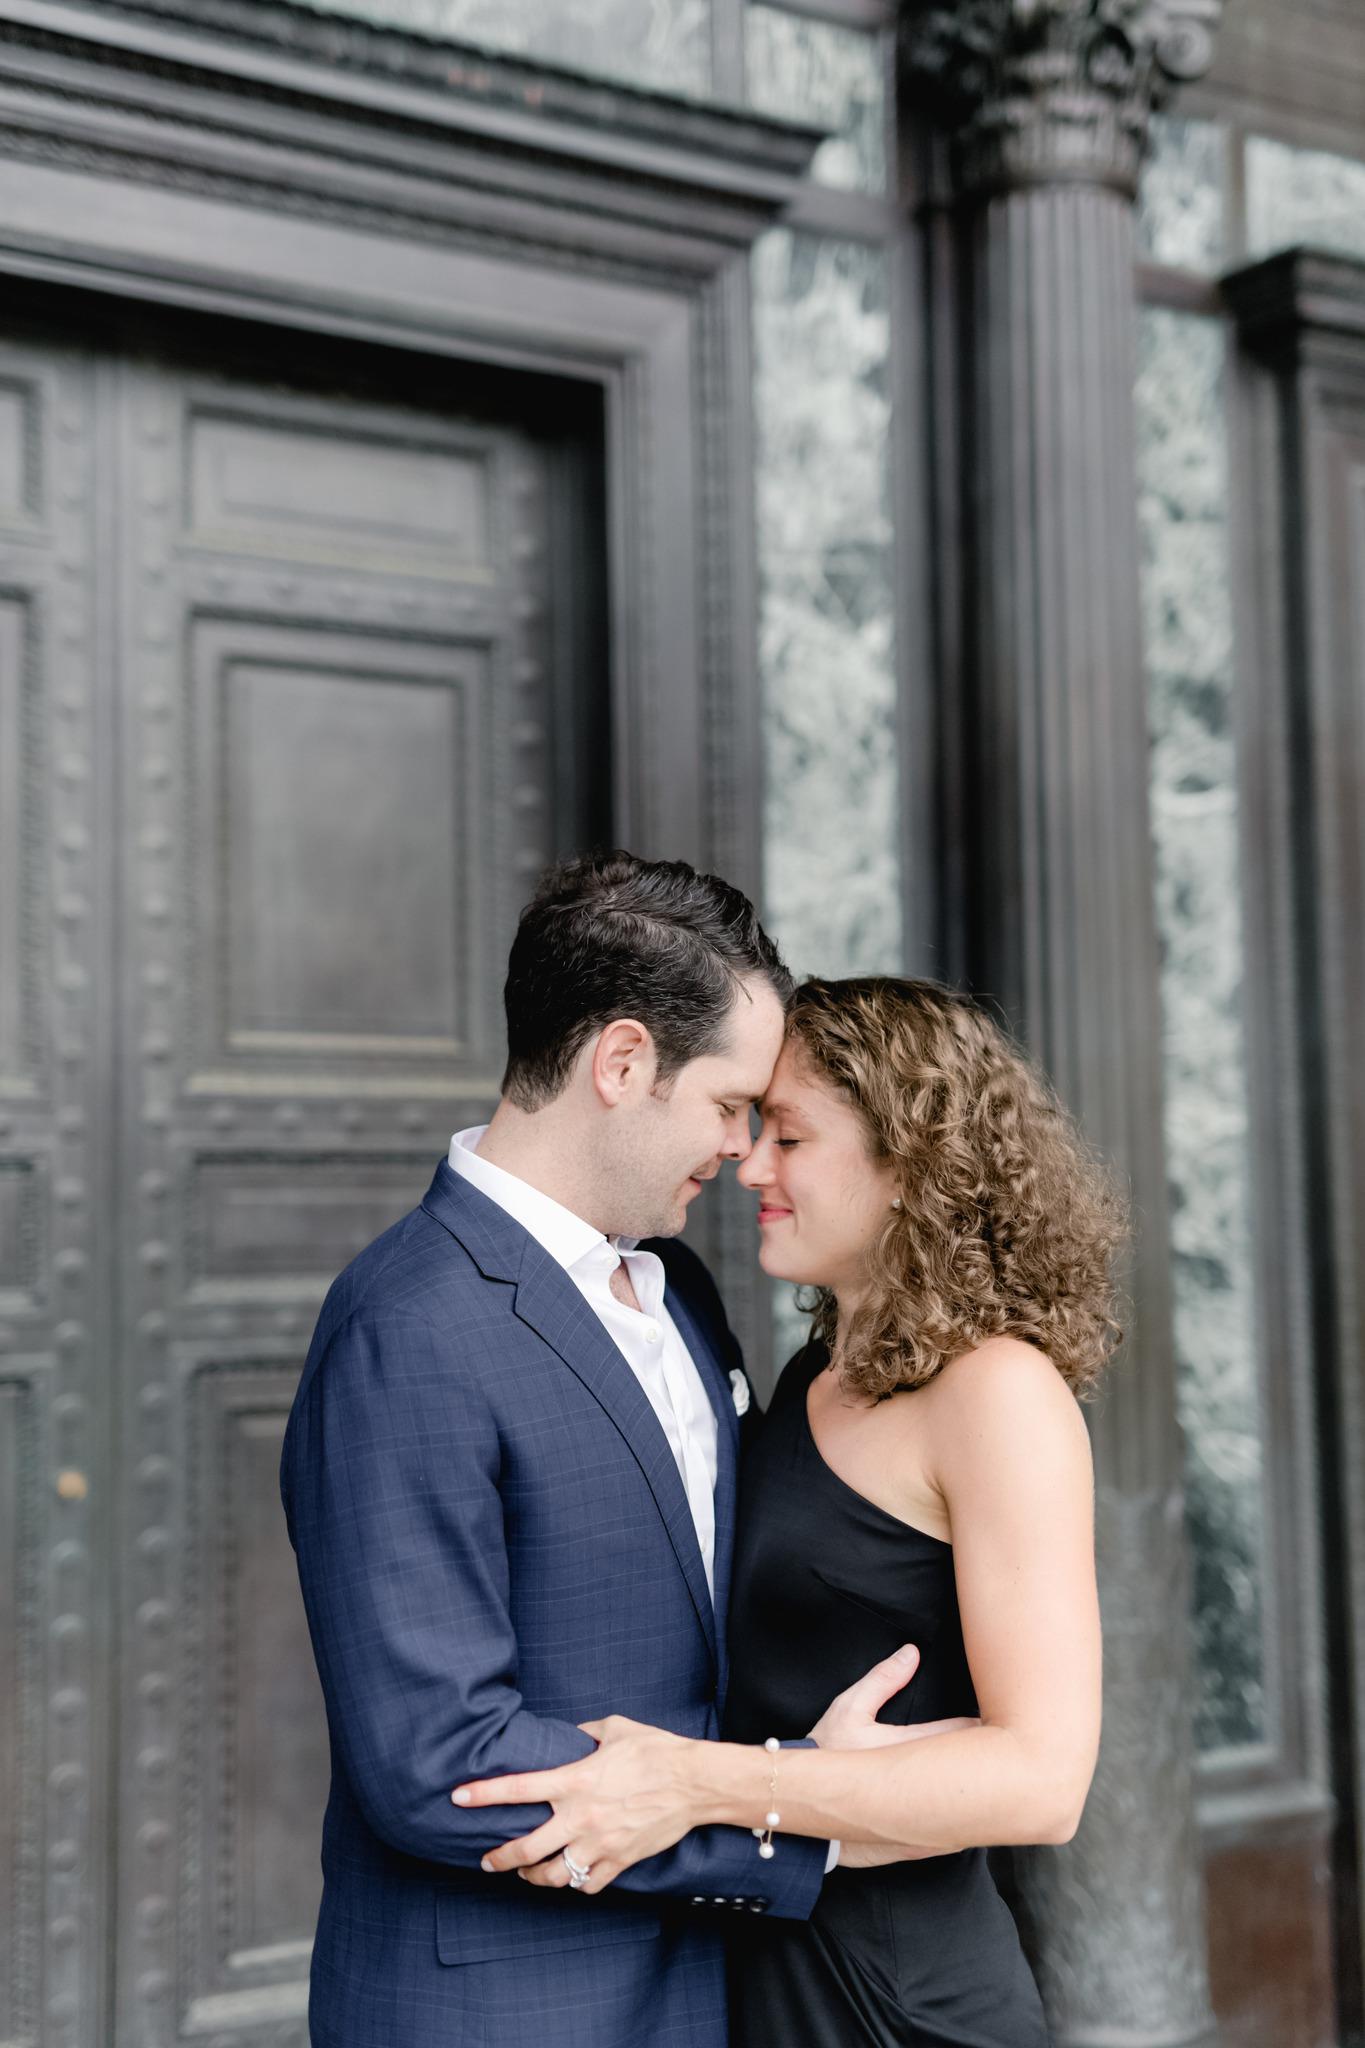 nyc engagement photos_nyc elopement_ct wedding photographer-8.jpg